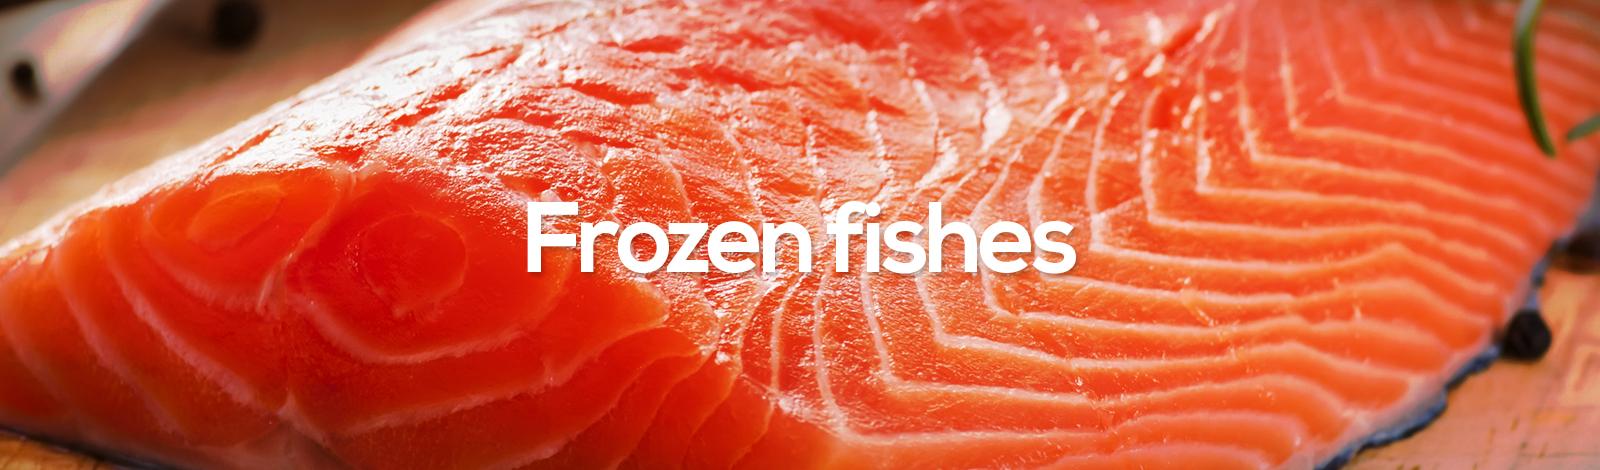 banner-produtos_fish